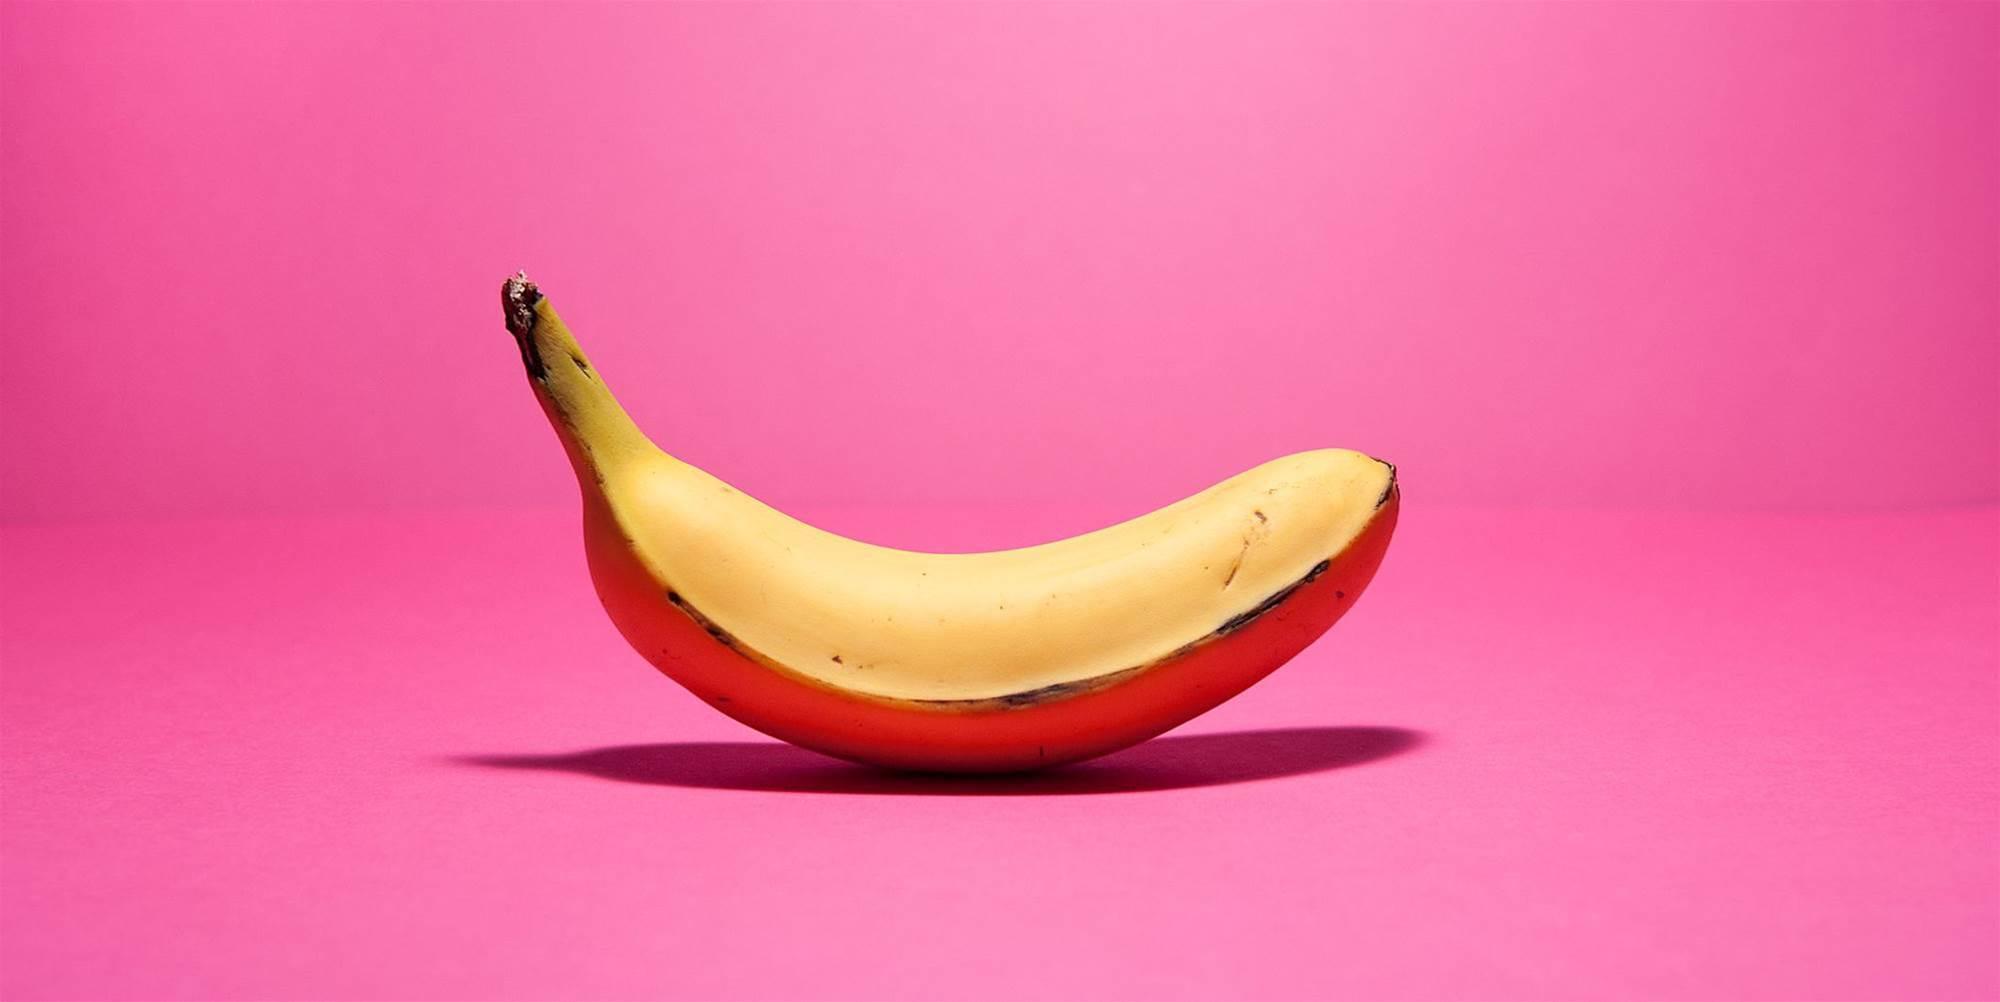 10 Science-Backed Health Benefits of Bananas